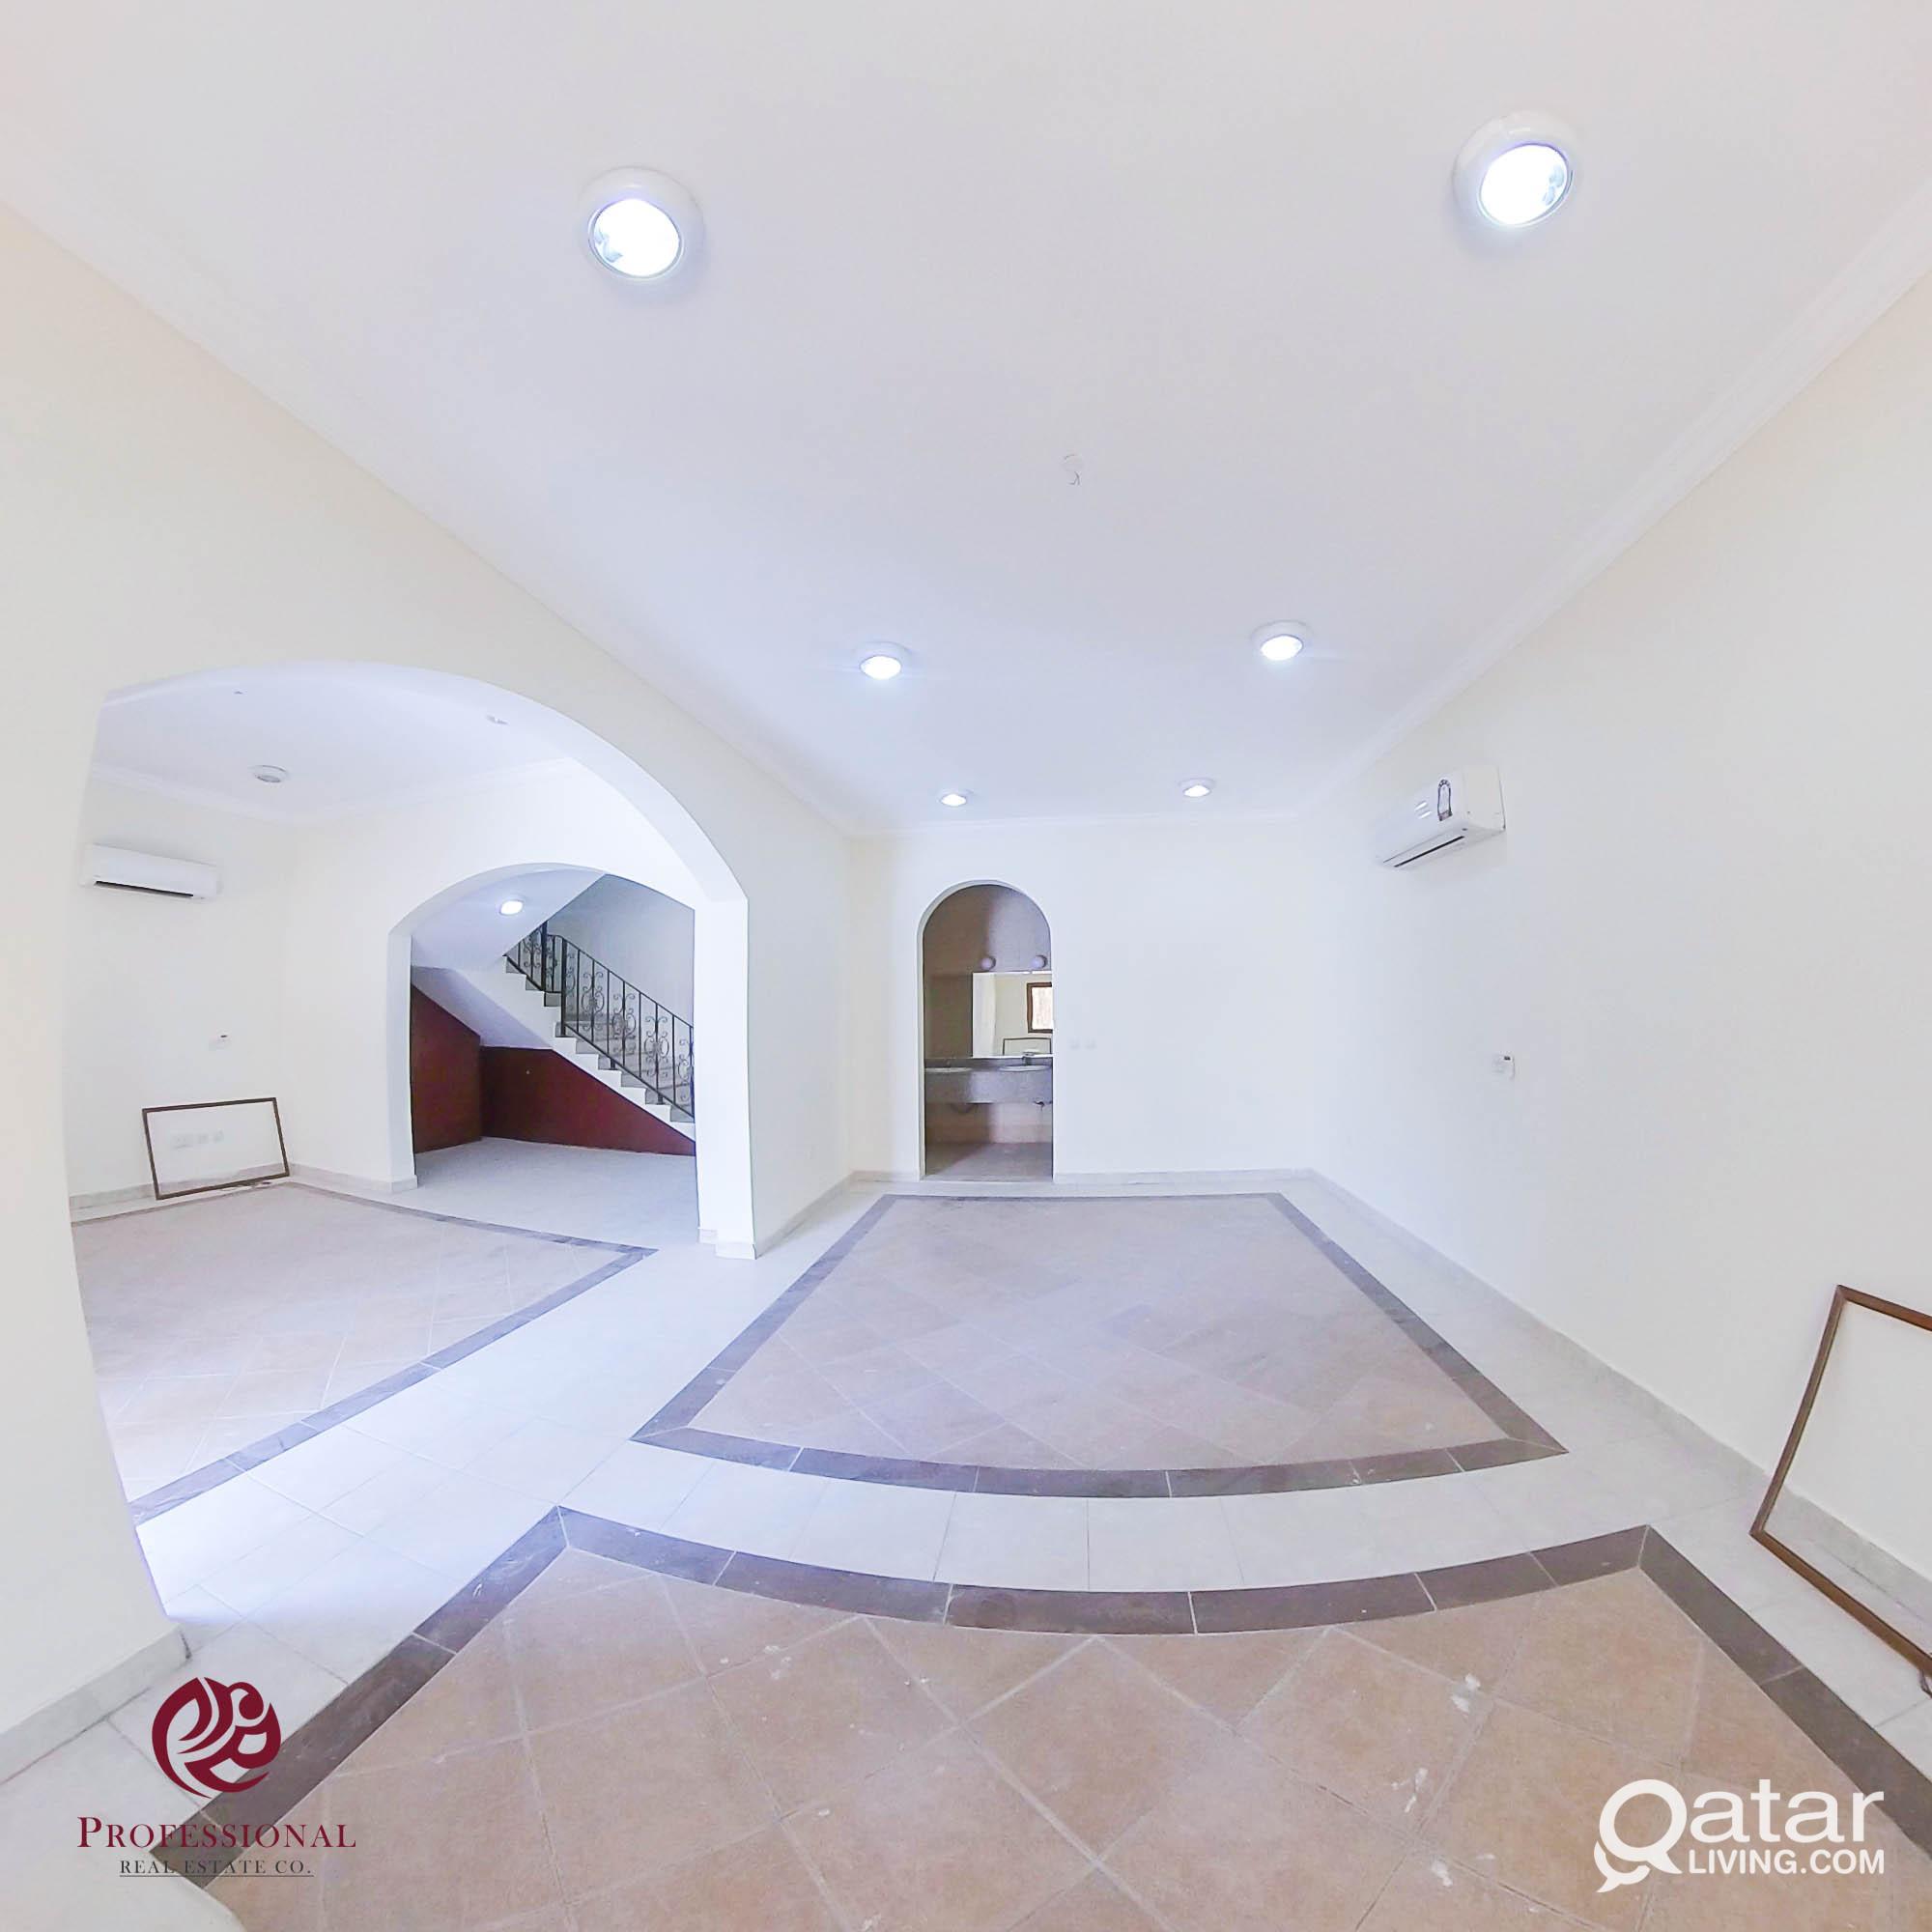 Unfurnished, 5 BHK Compound Villa in Madinat Khali